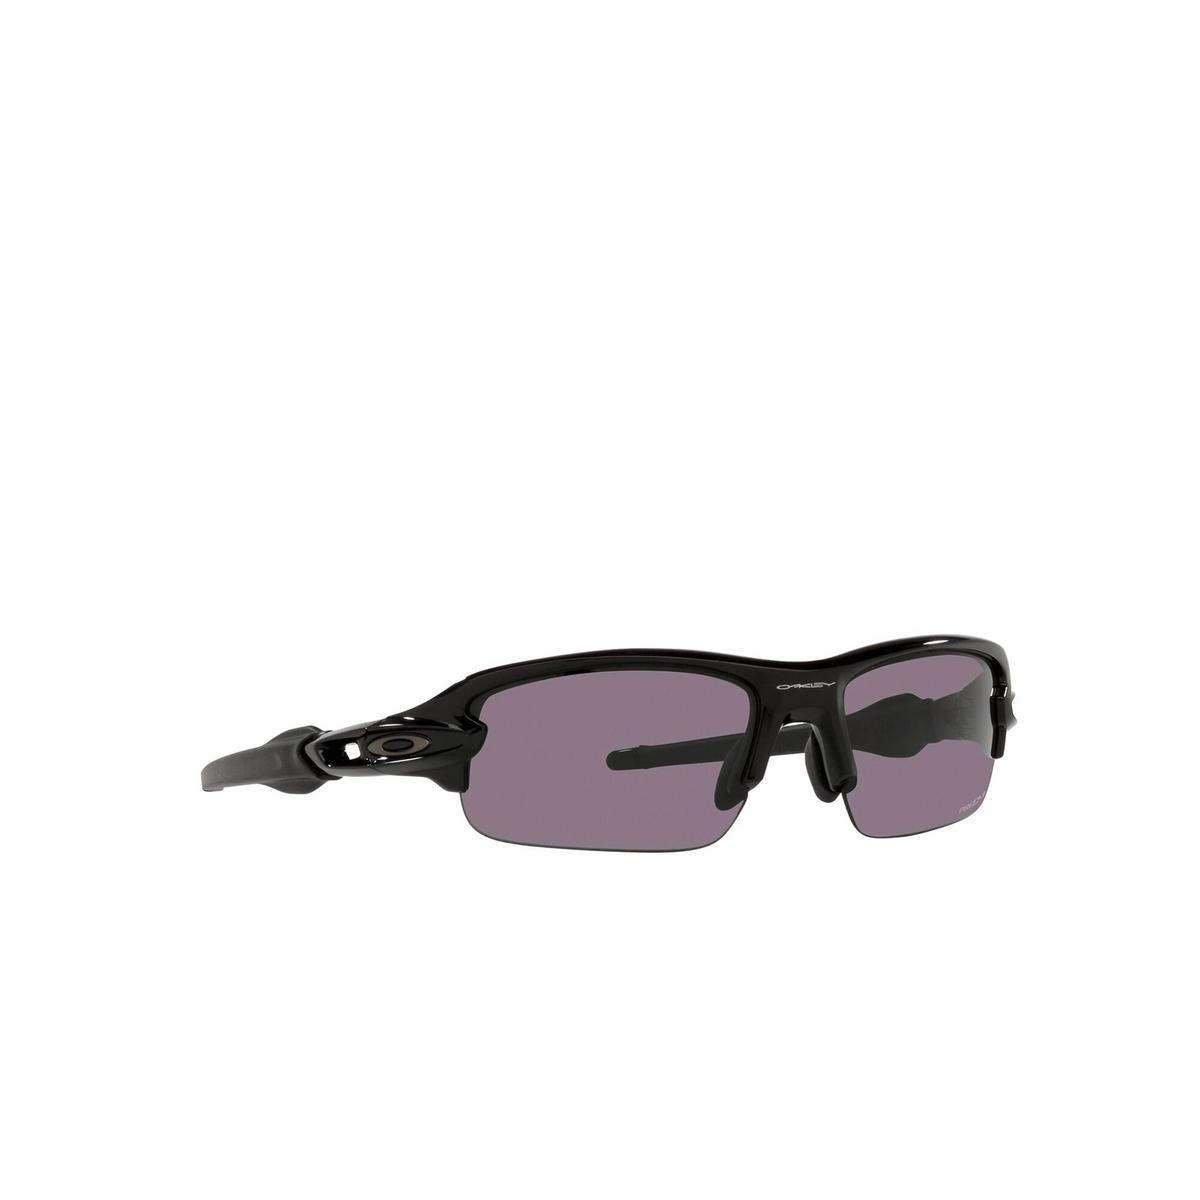 Oakley® Rectangle Sunglasses: Flak Xxs OJ9008 color Polished Black 900801 - three-quarters view.